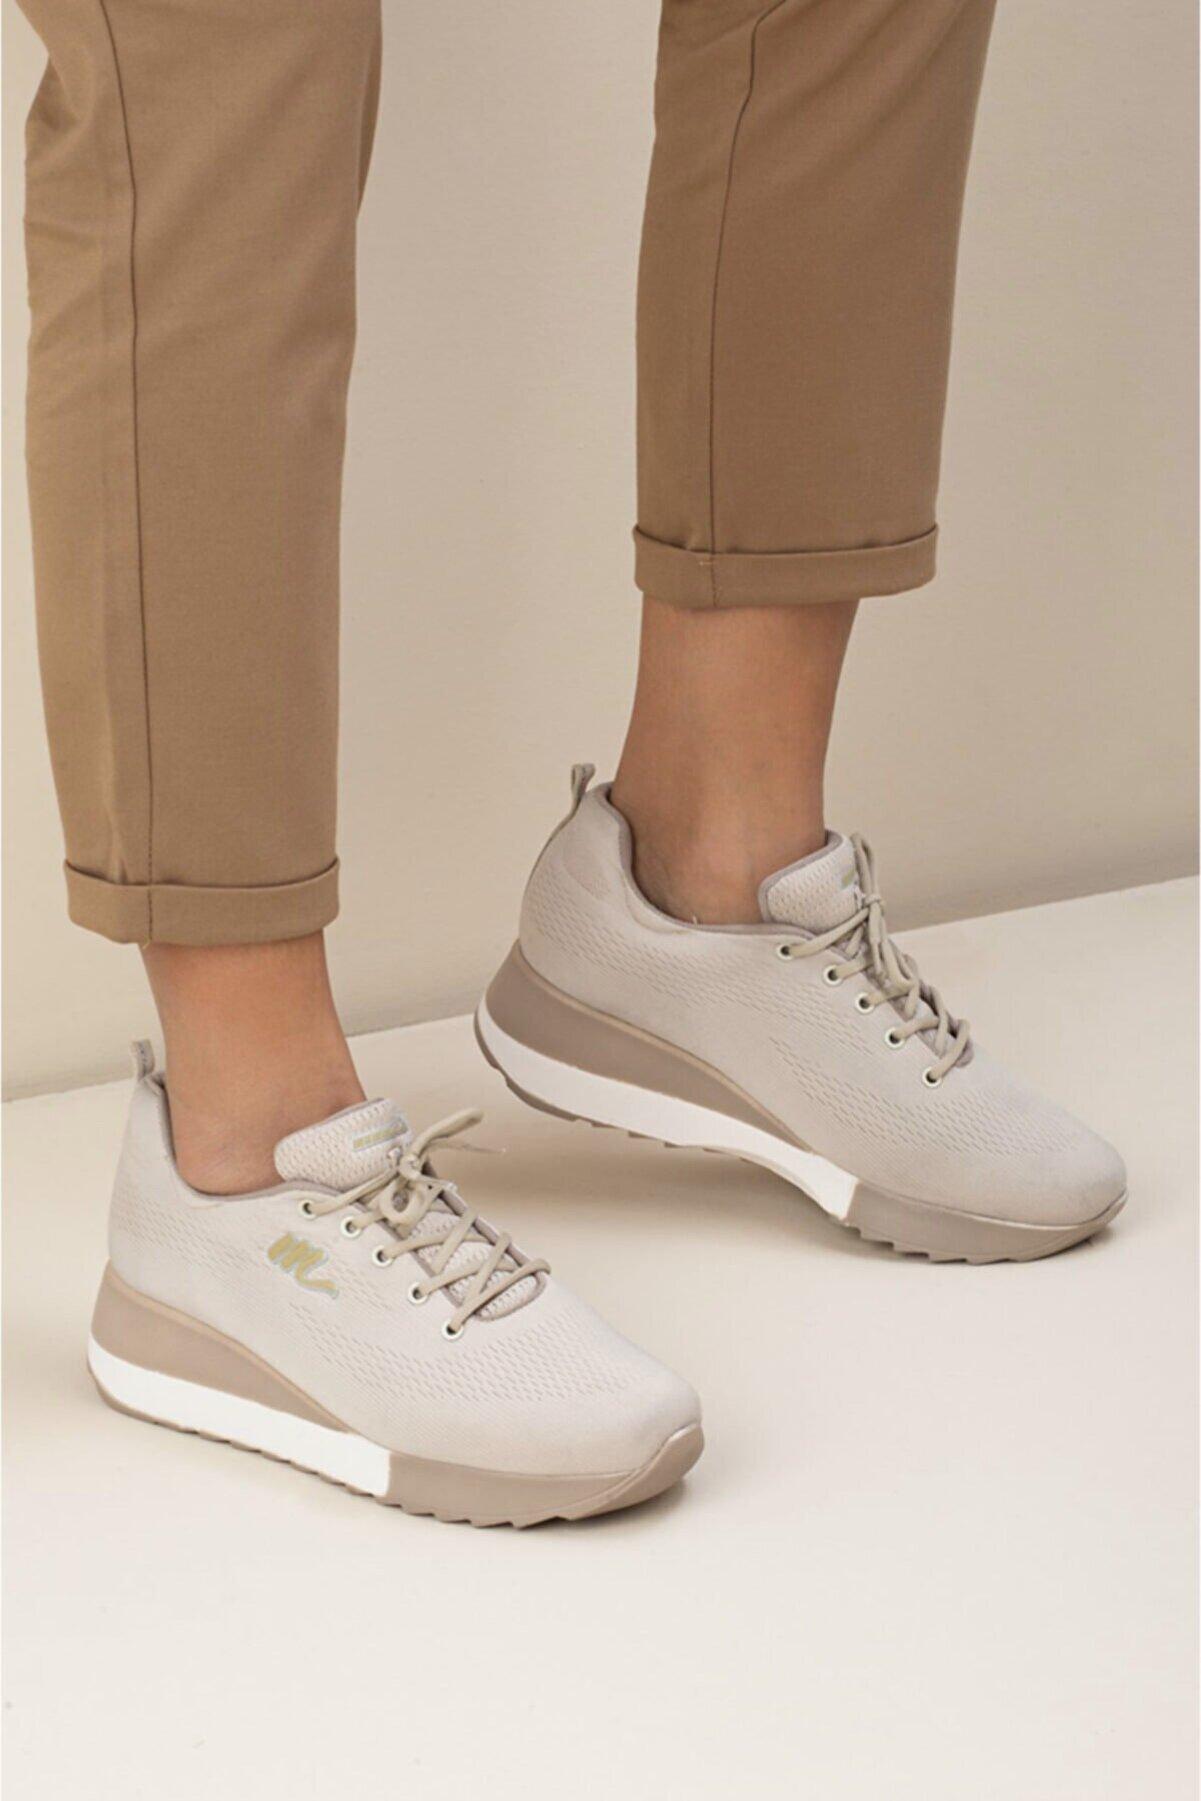 Mammamia Mammamıa 825 Dolgu Kadın Ayakkabı 0421825